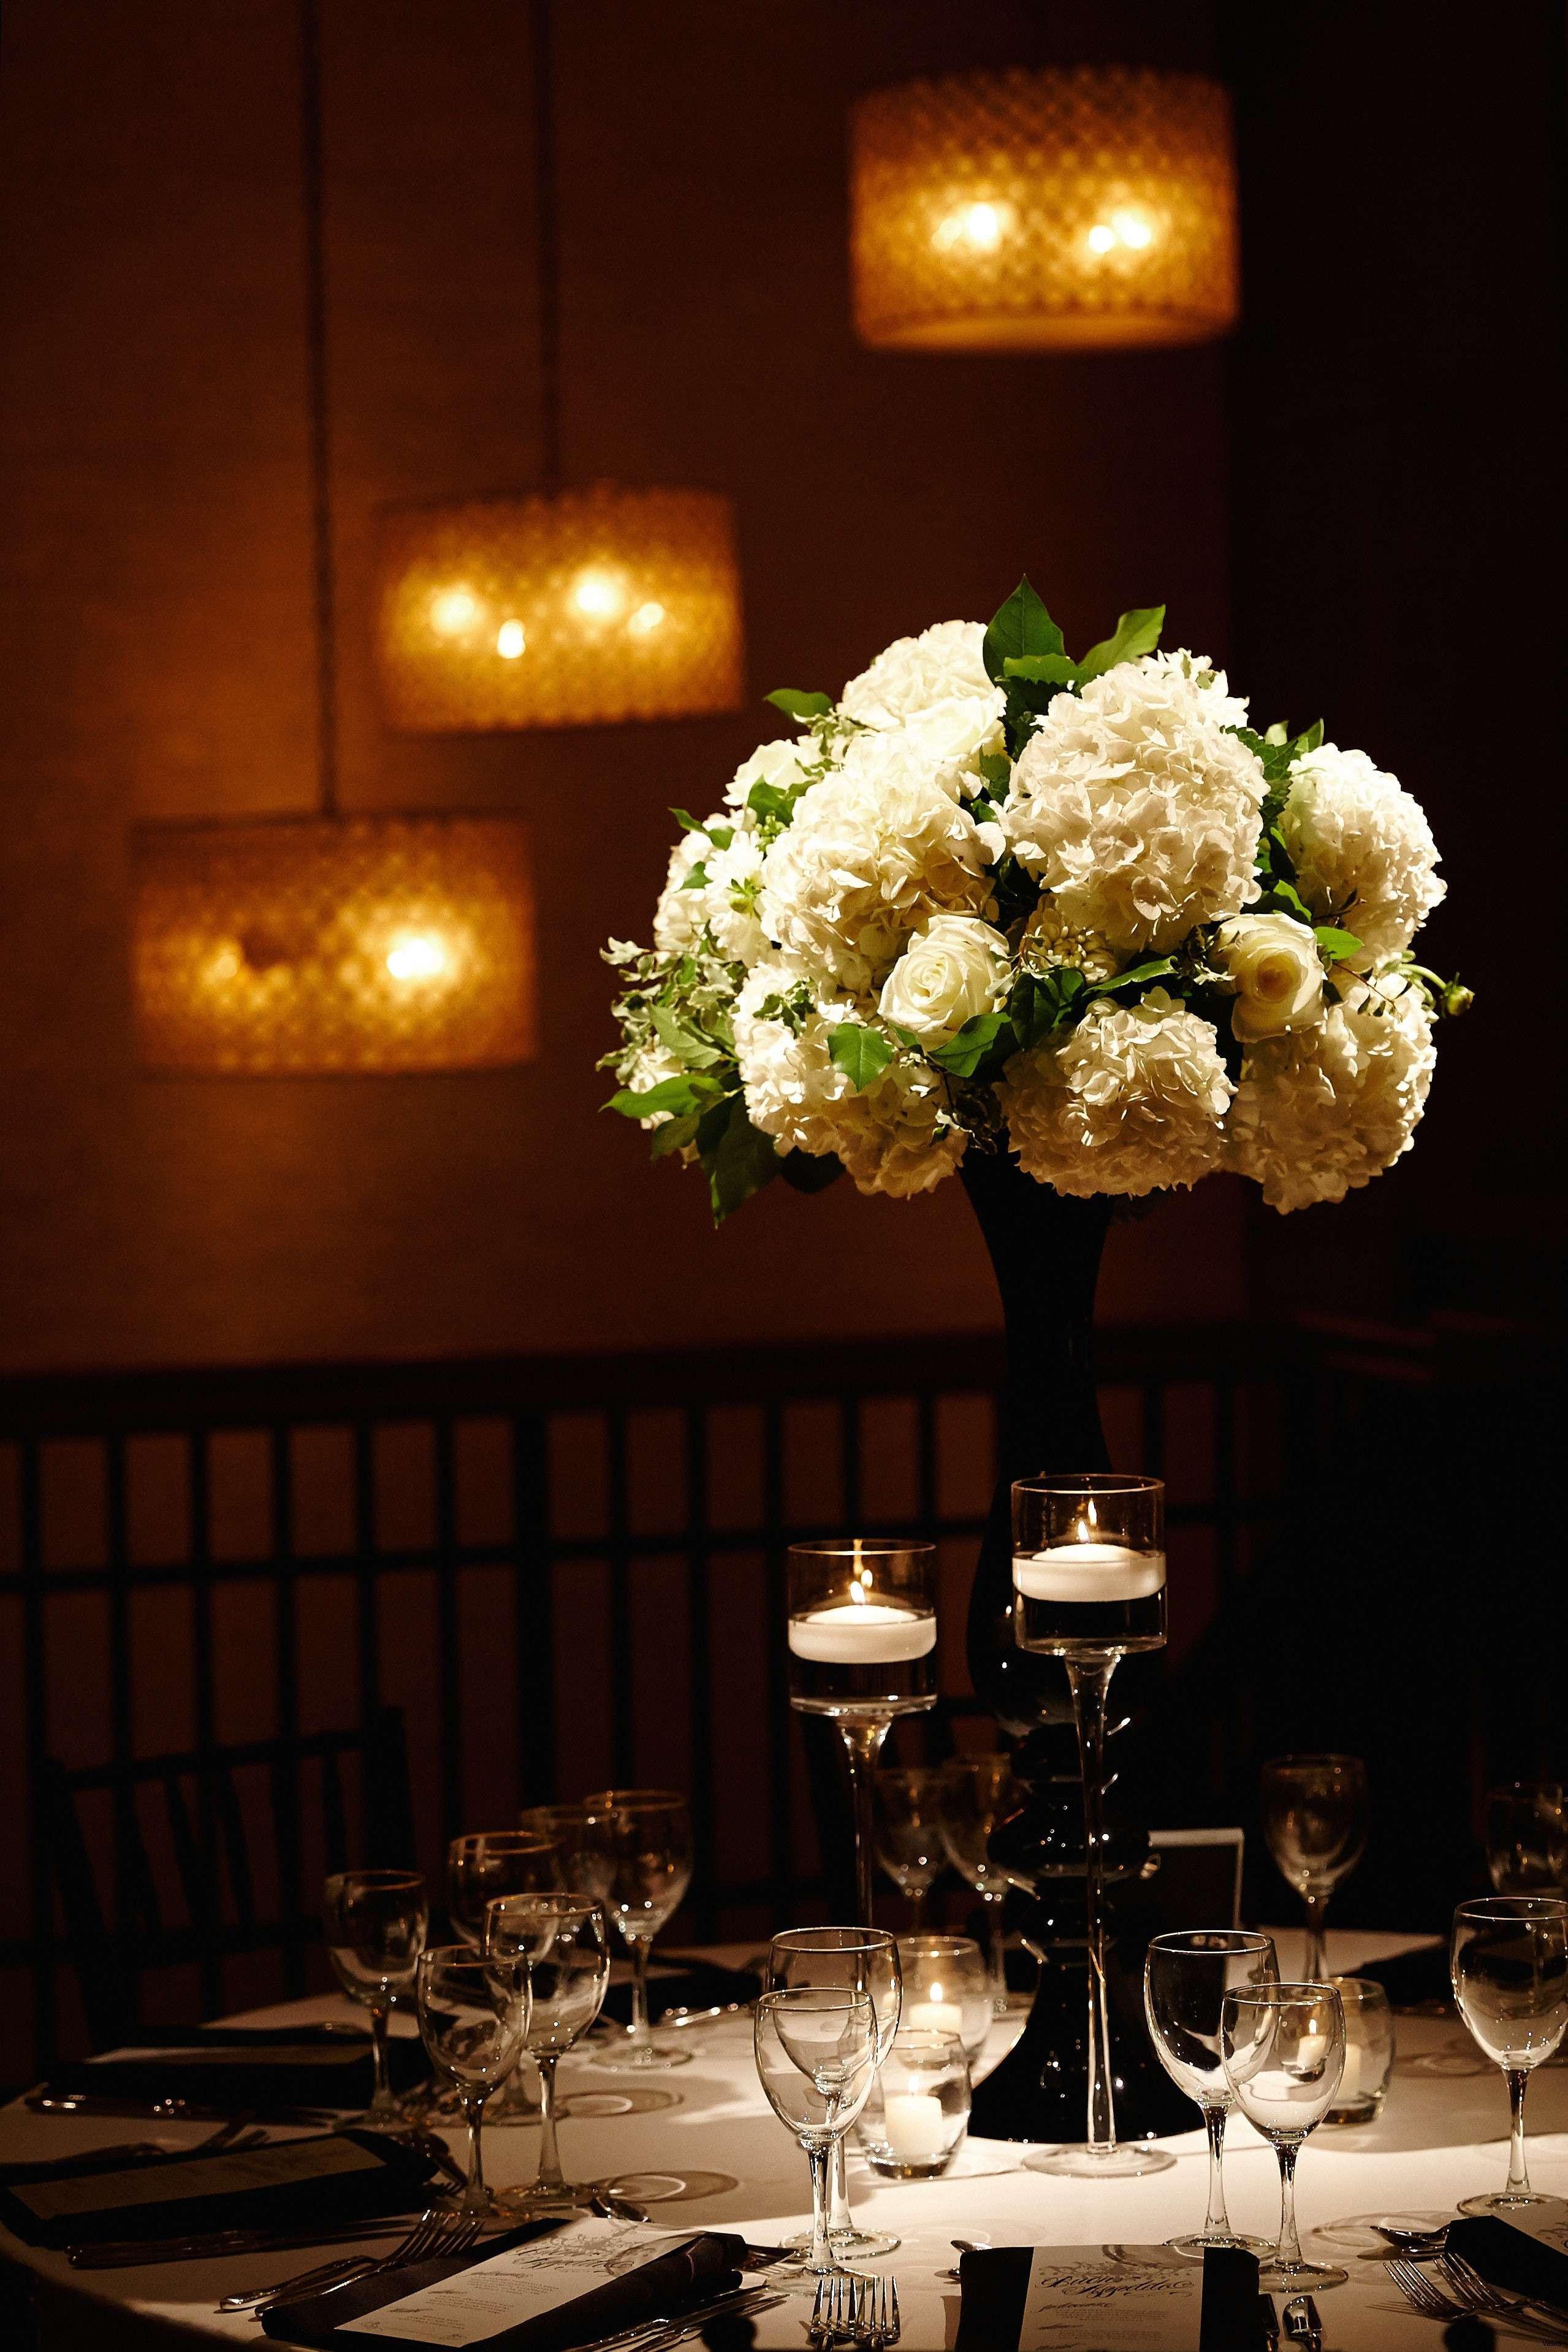 Small Vintage Vases Bulk Of 19 Elegant Small Decorative Vases Bogekompresorturkiye Com In Il Fullxfull H Vases Black Vase White Flowers Zoomi 0d with Design Design Ideas Vase